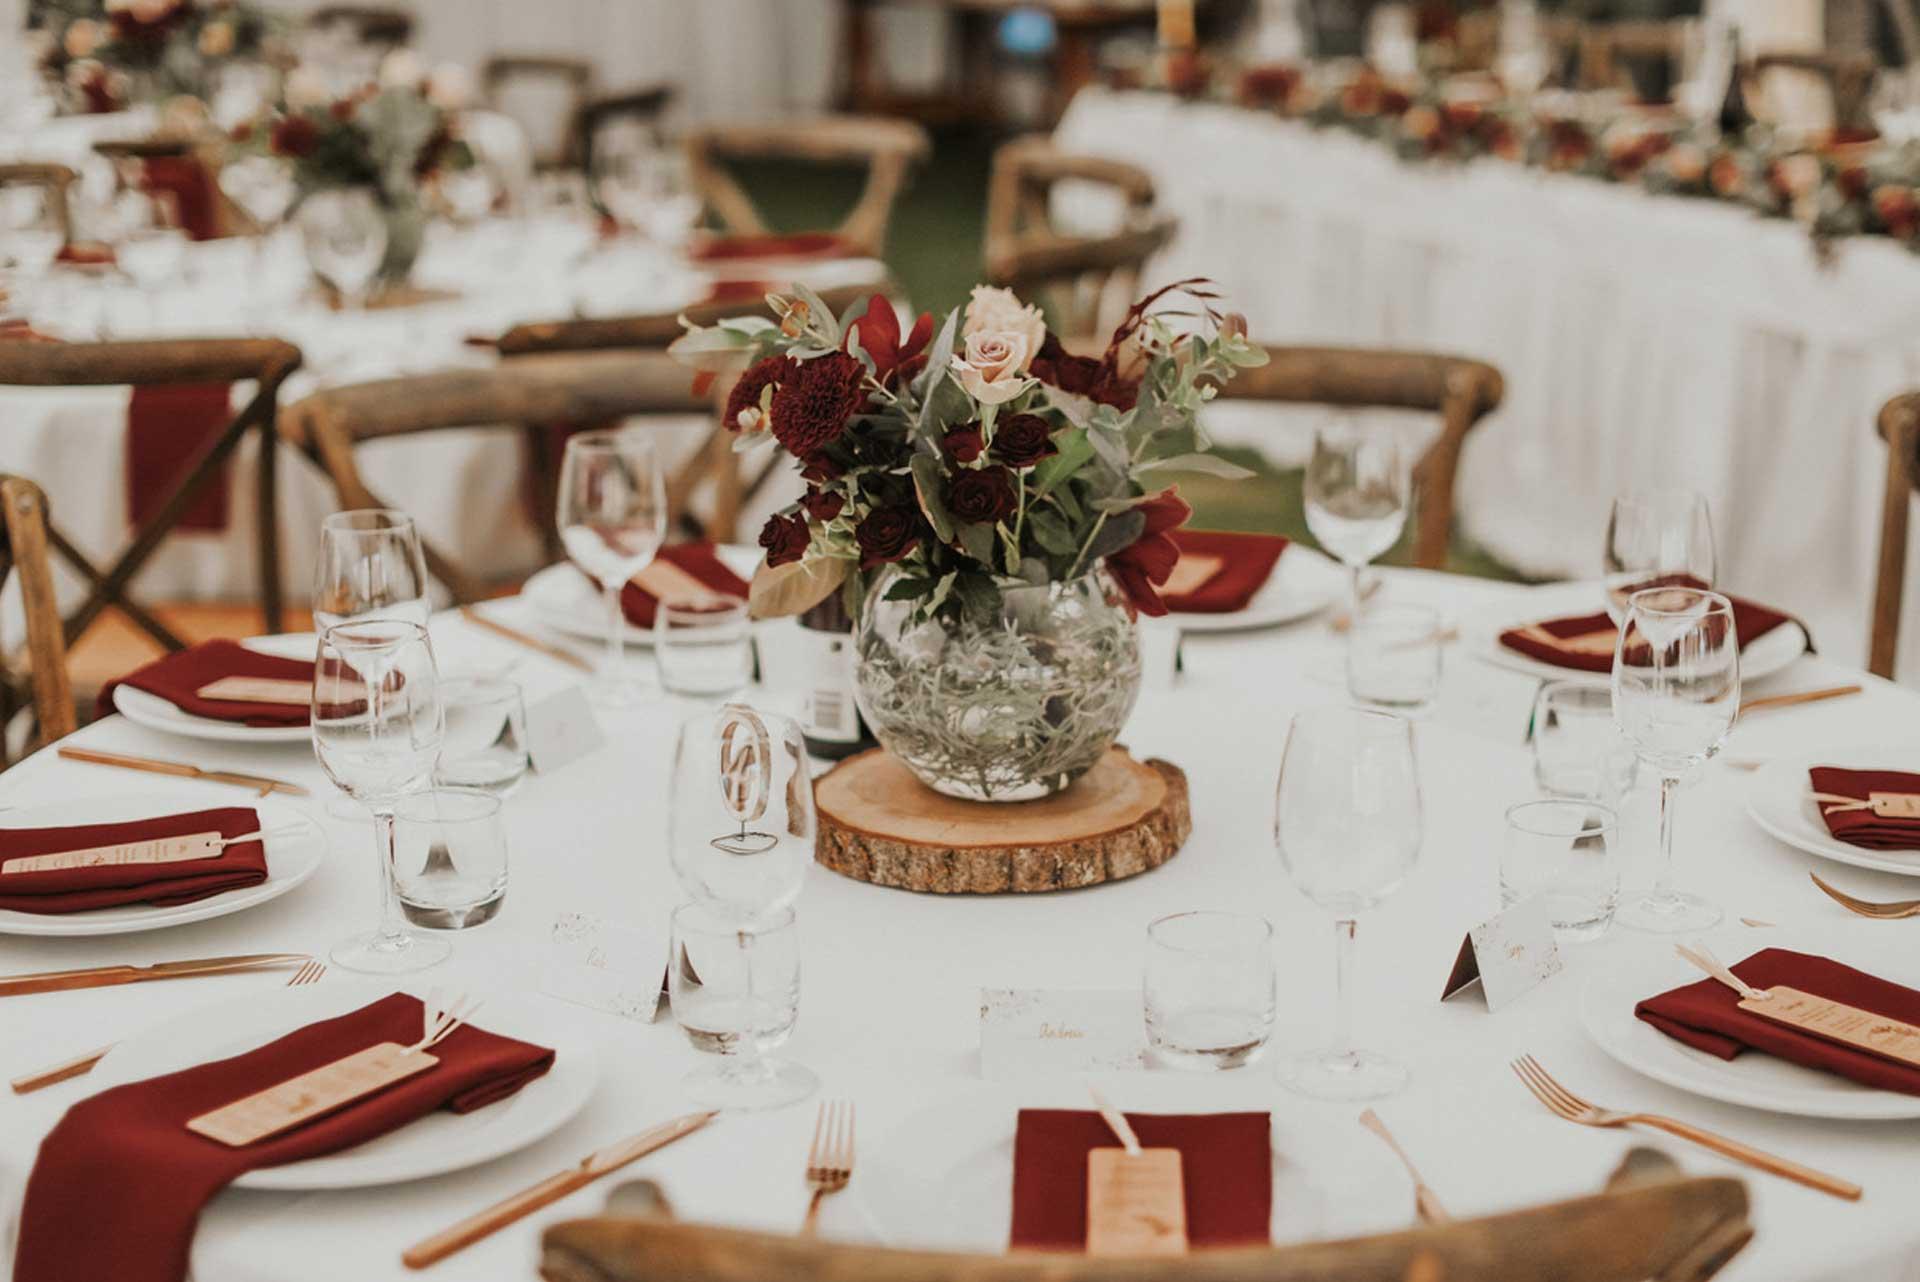 silk-estate-marquee-weddings-and-events-blog-elizabeth-scott-4